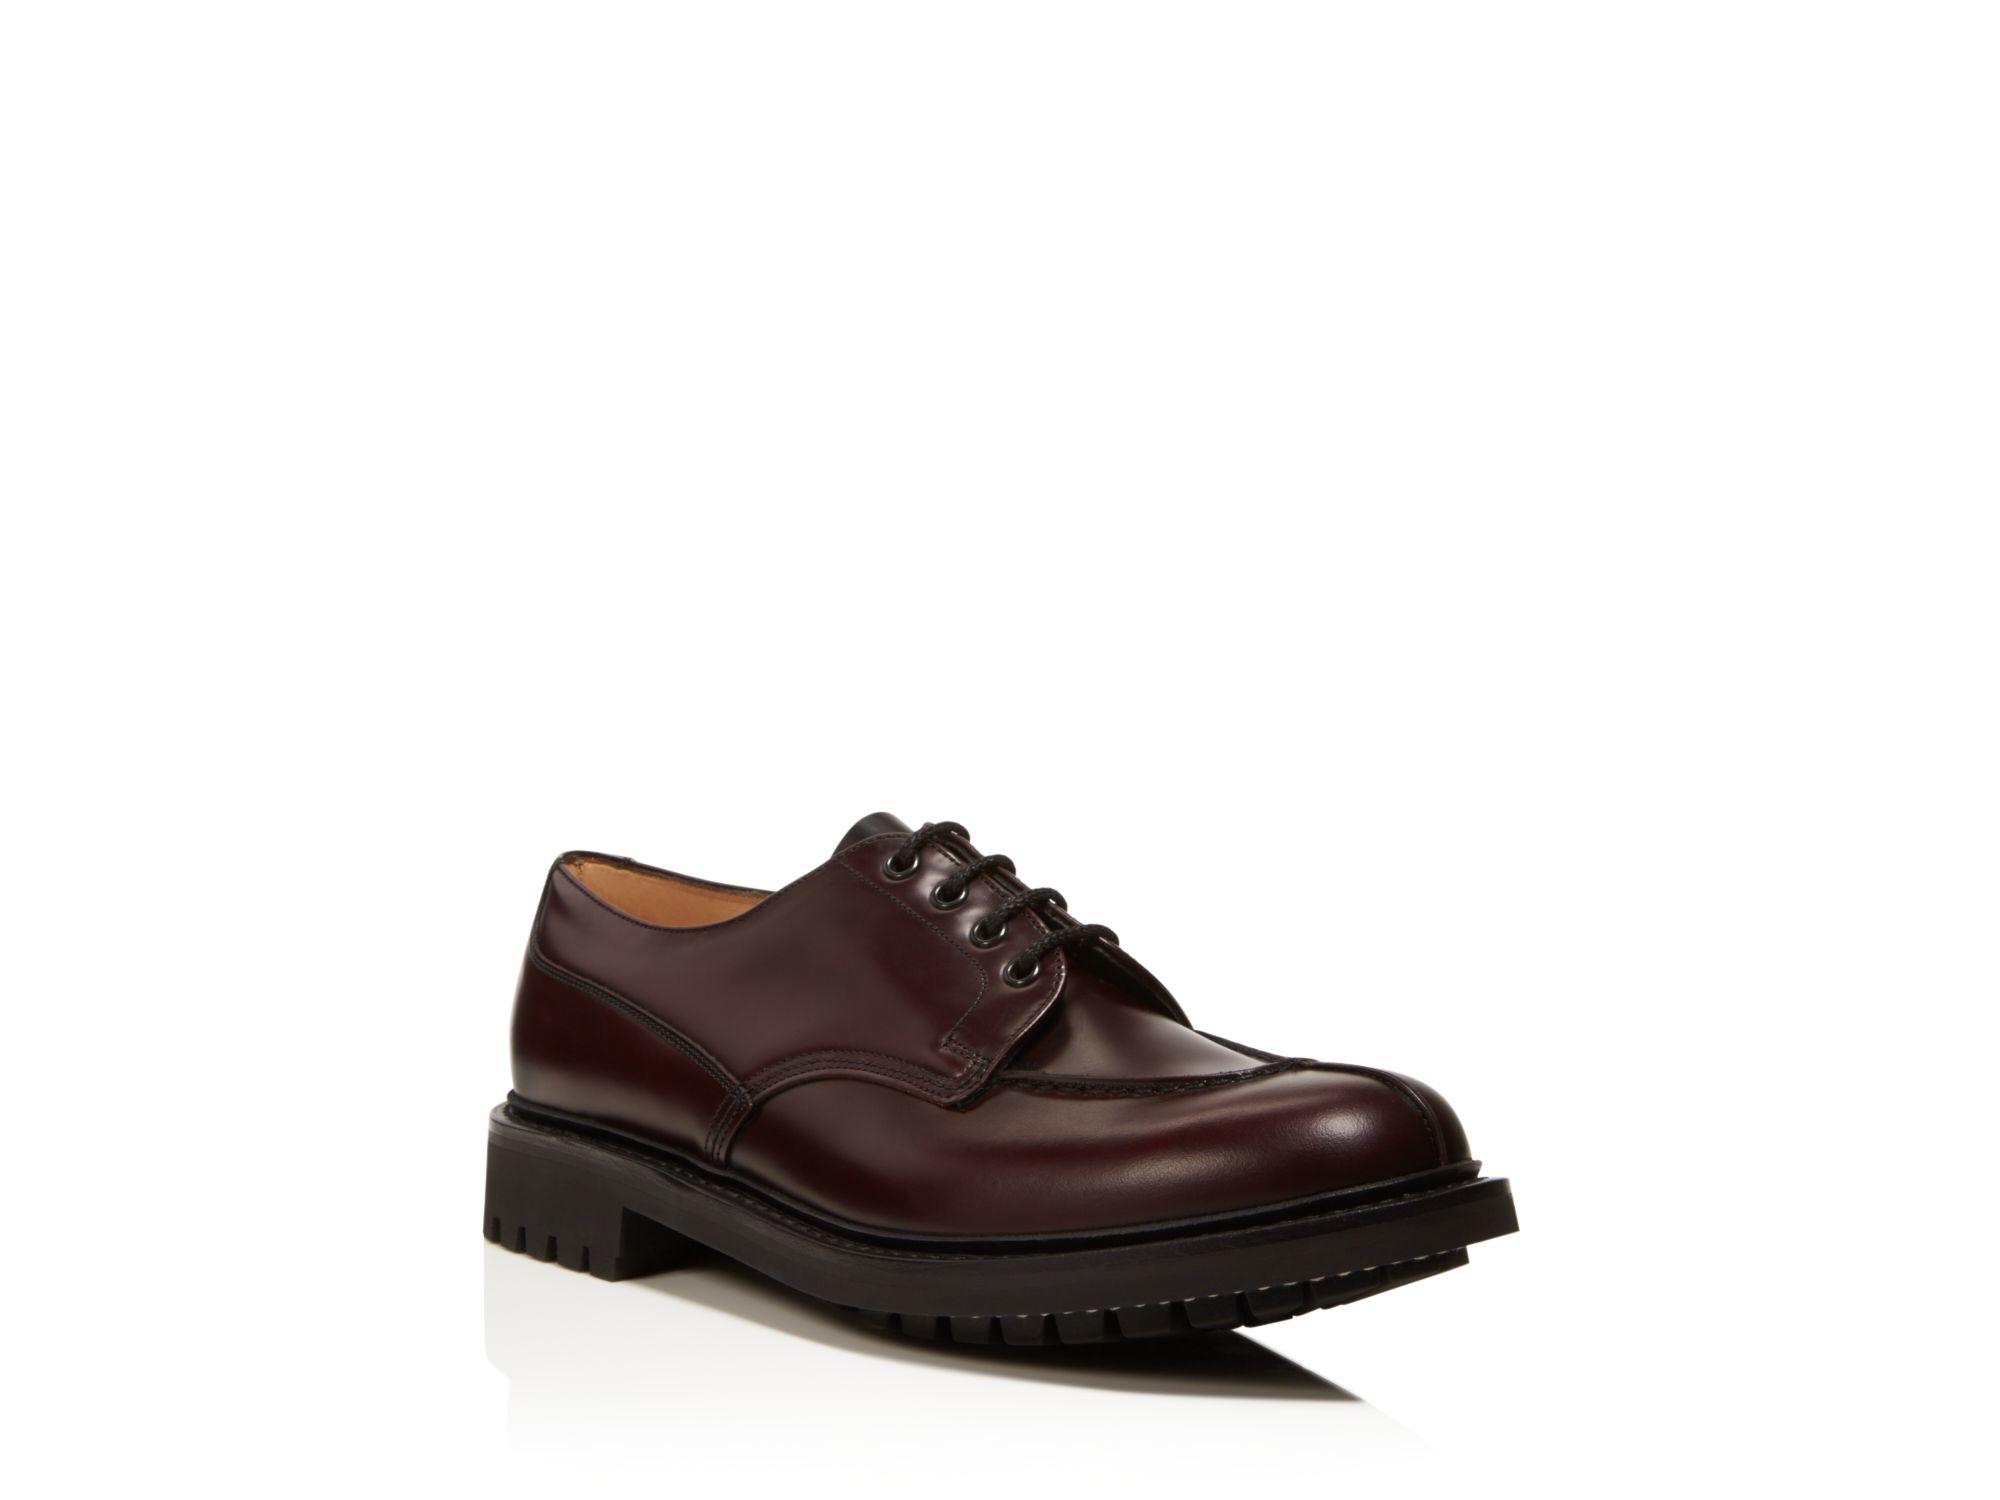 Sold England Church S Shoes Women